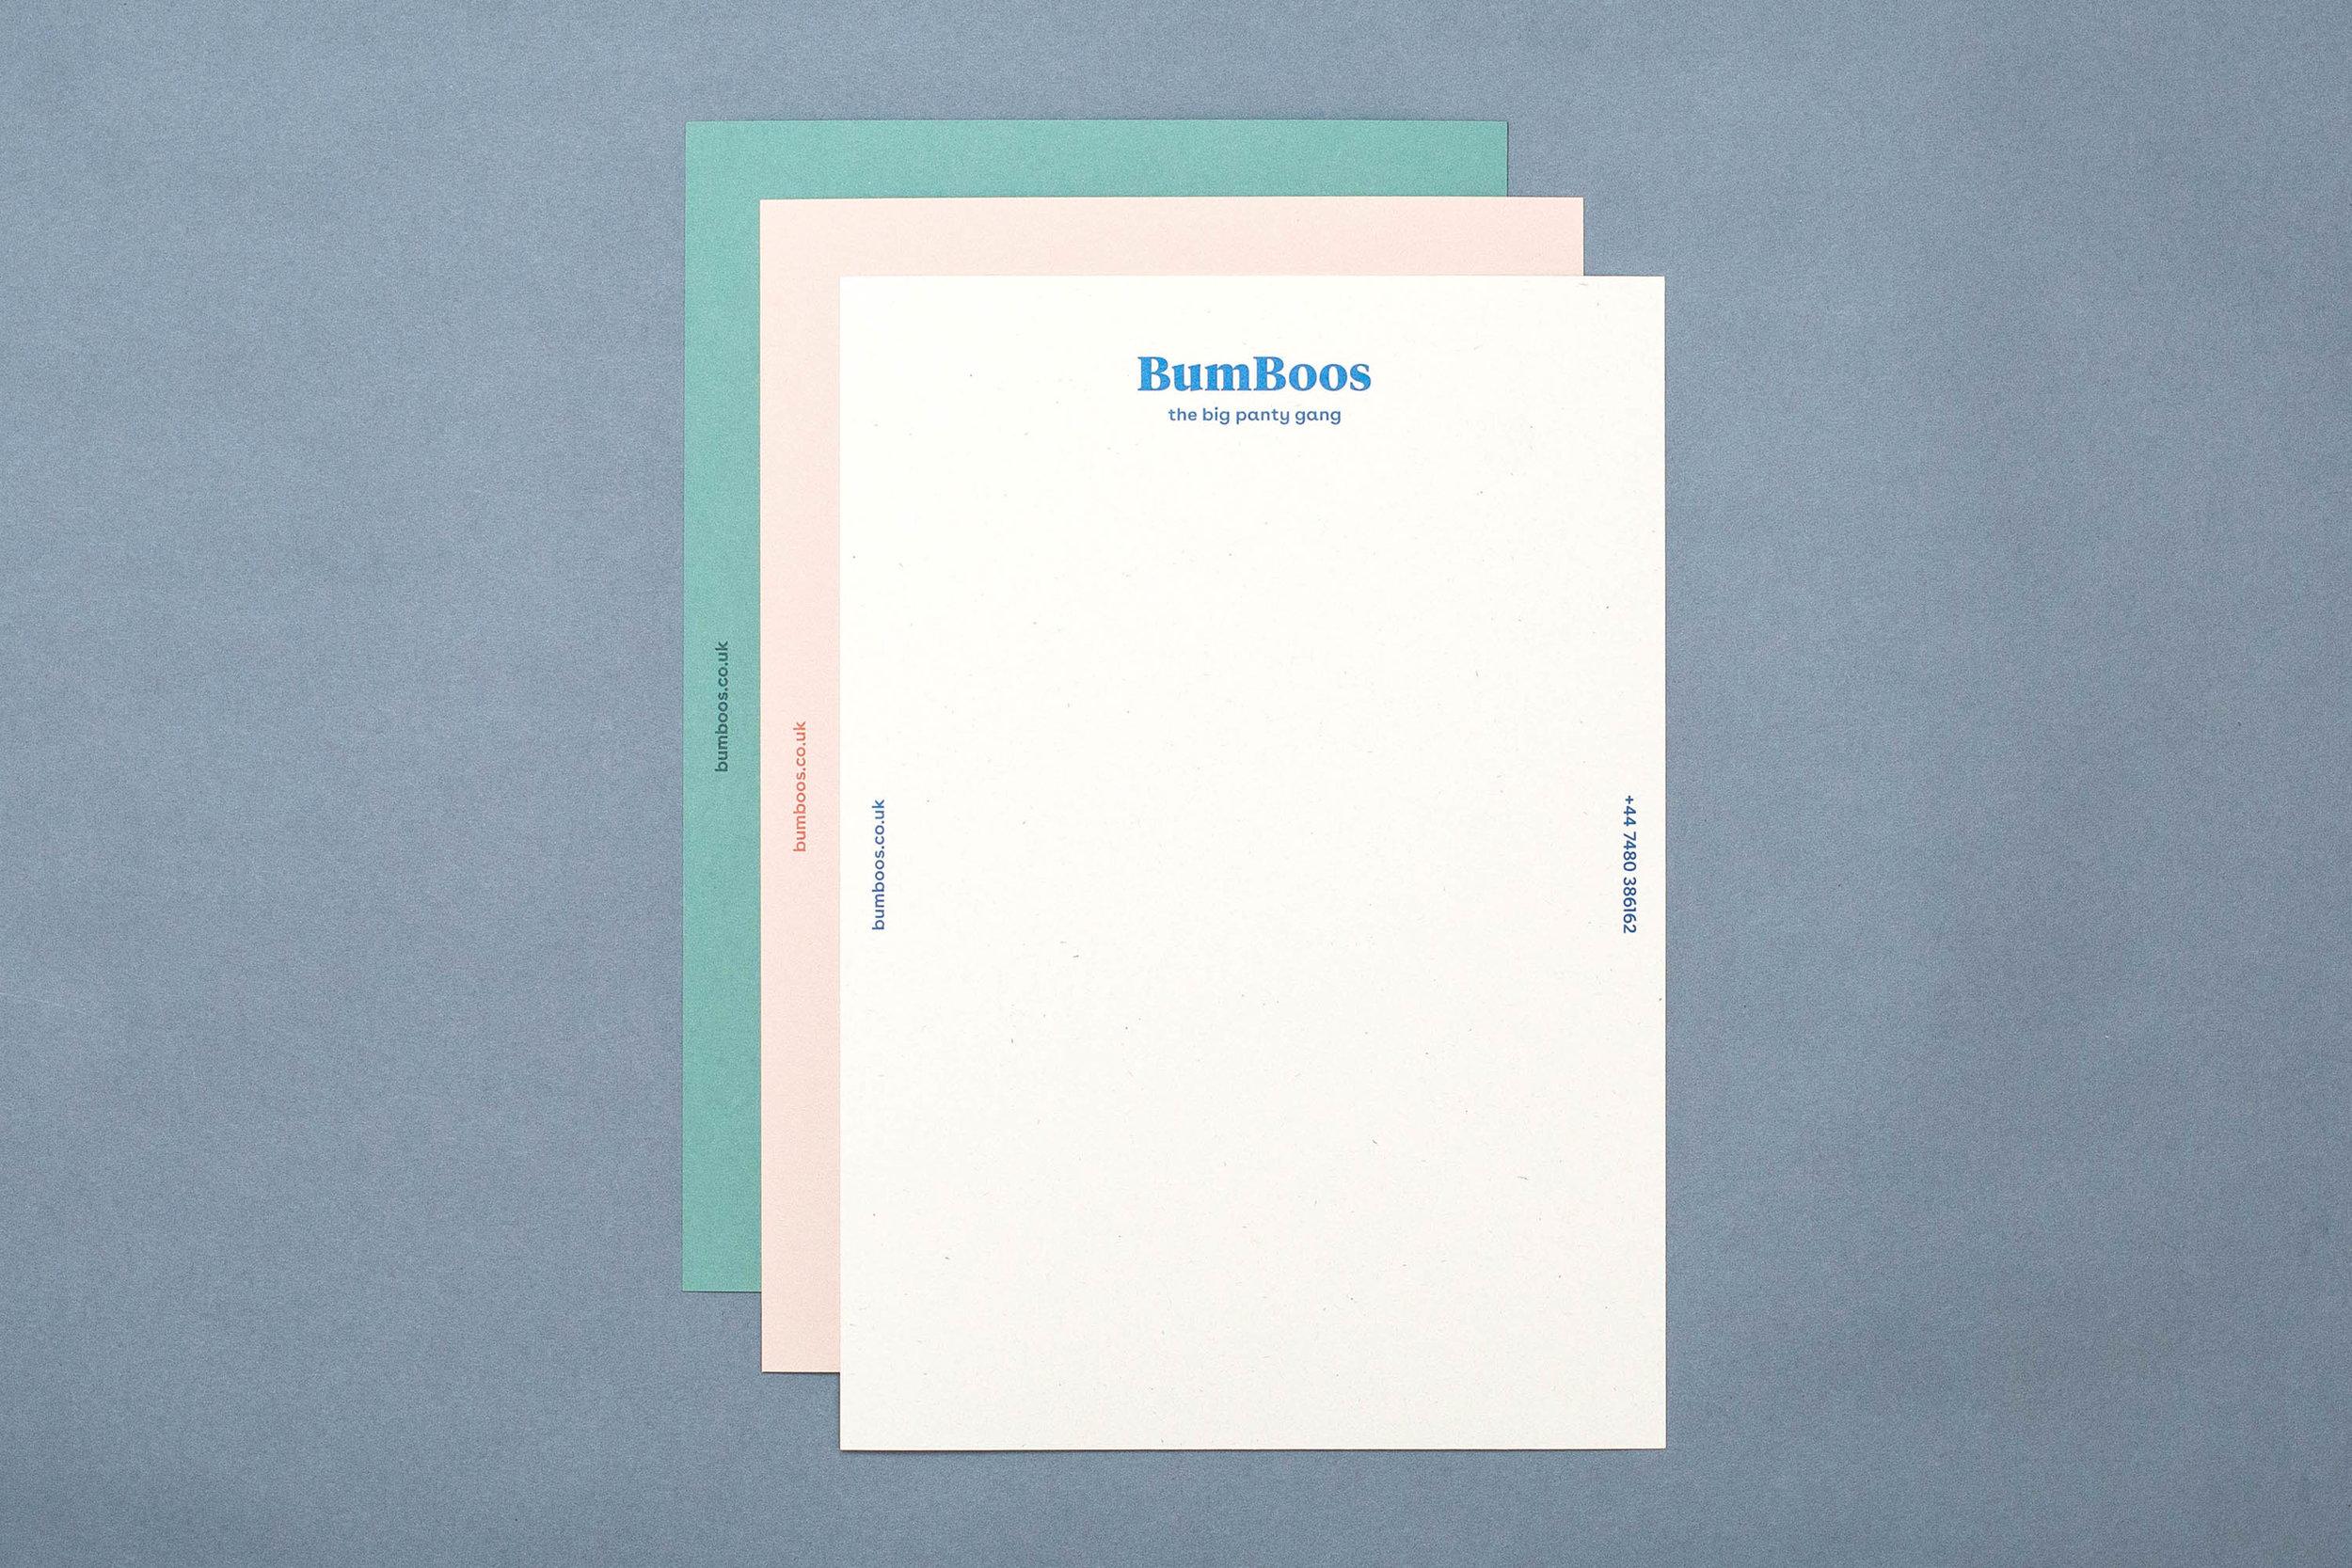 bumboos_7.jpg